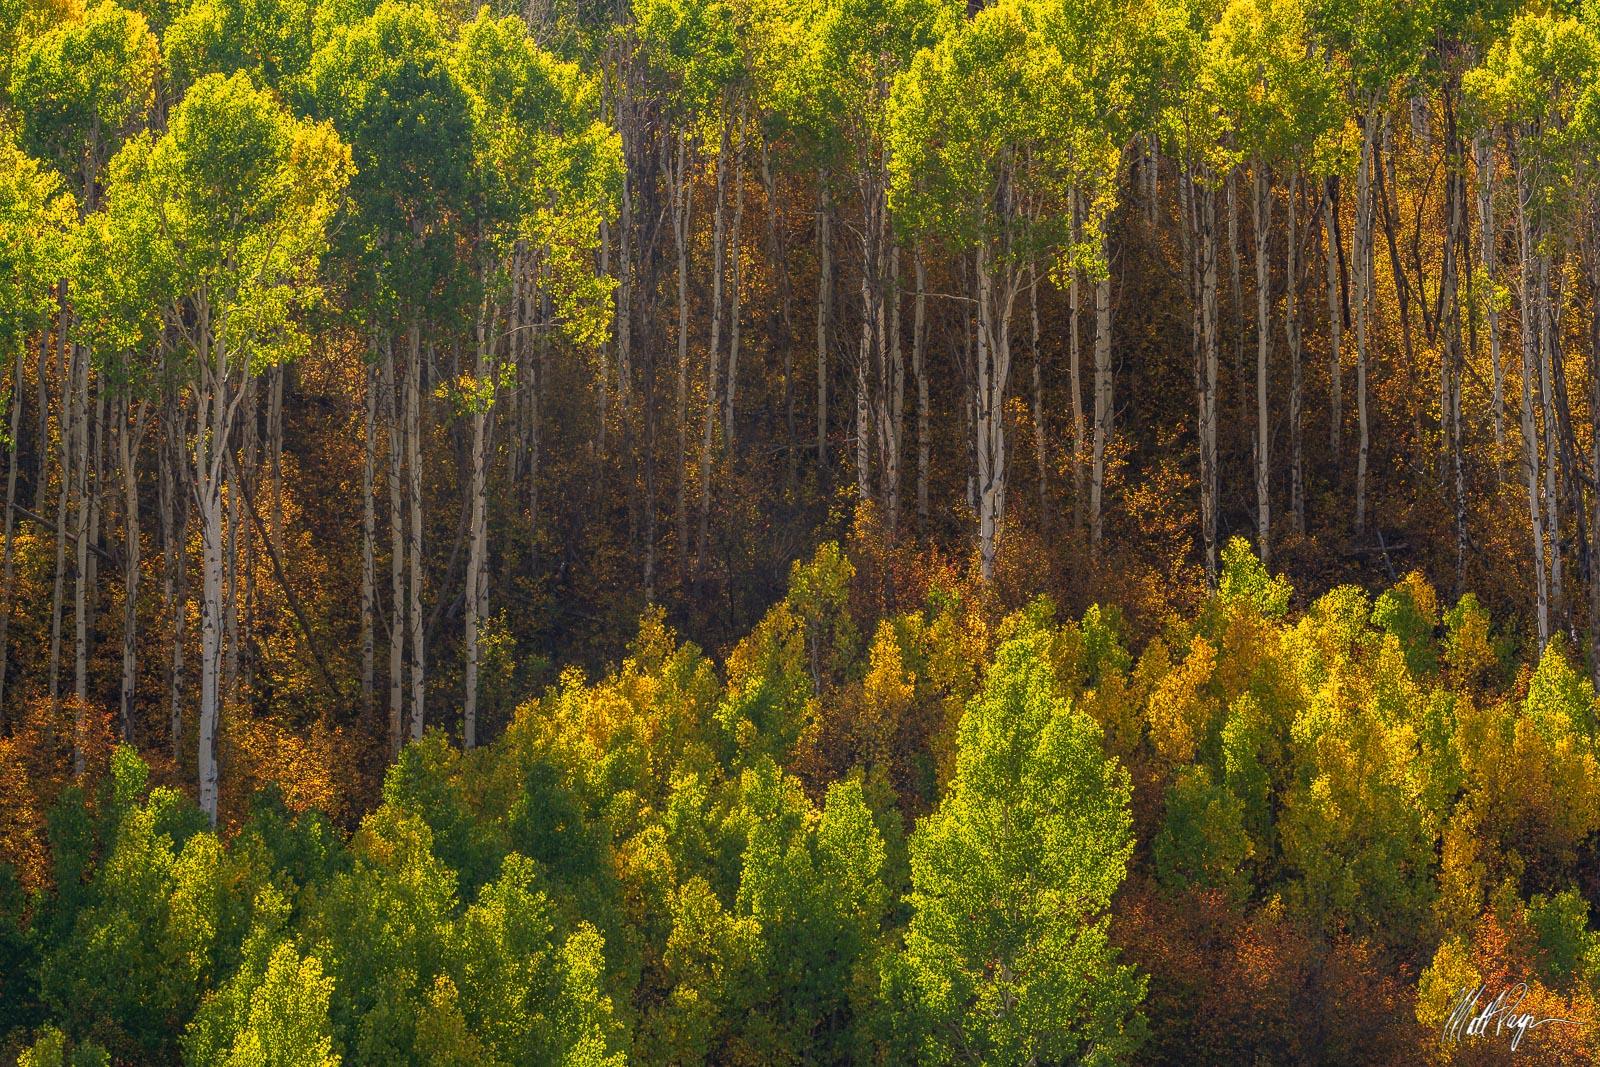 Aspen Trees, Autumn, Colorado, Fall, Colors, Glow, Landscape, Nature, seasons, warm, Scrub oak, Gunnison National Forest, foliage, photo